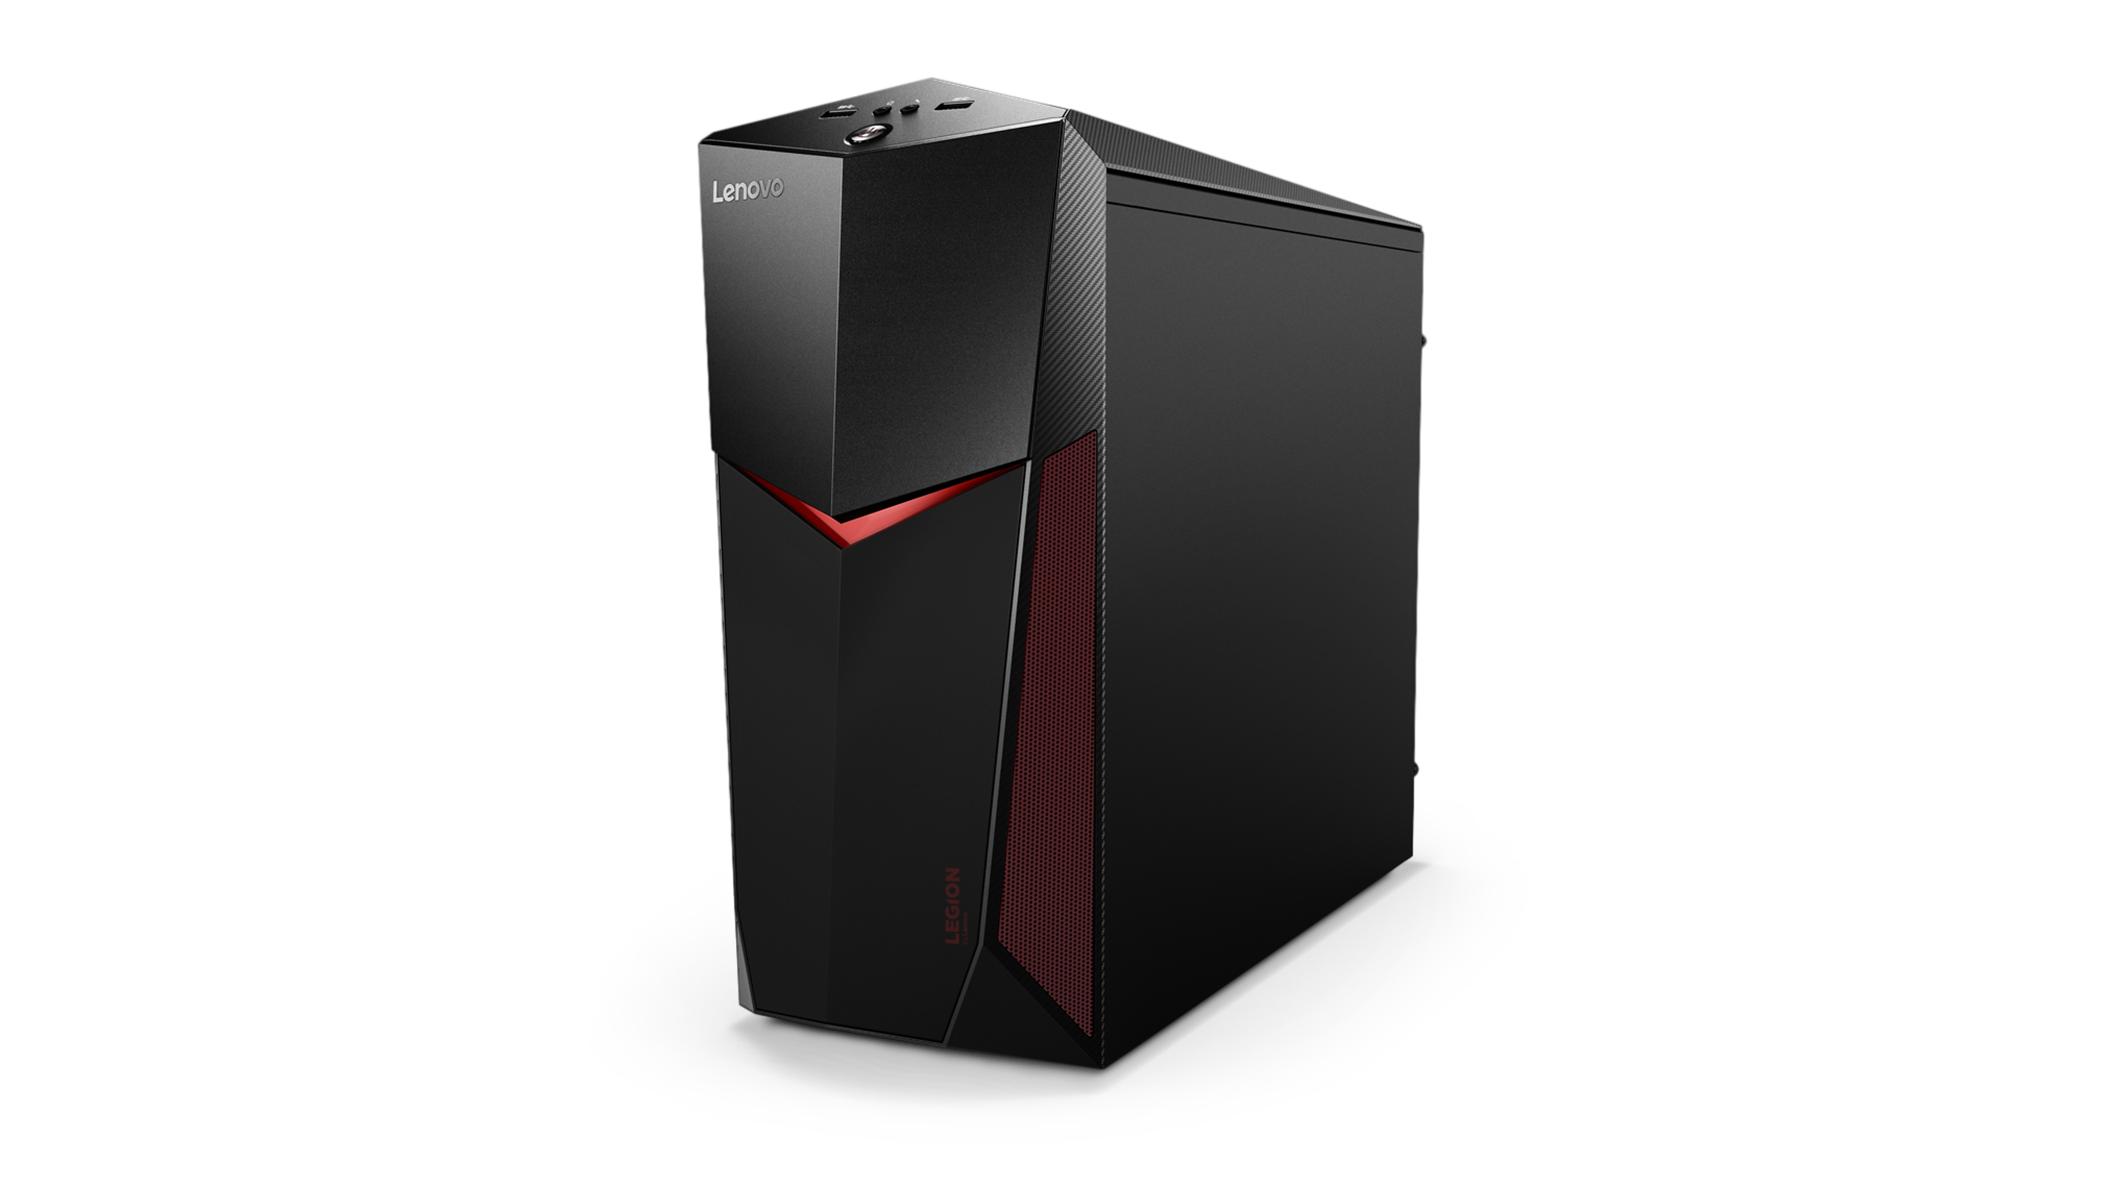 Lenovo ideacentre y cube ish ordinateur de bureau lenovo